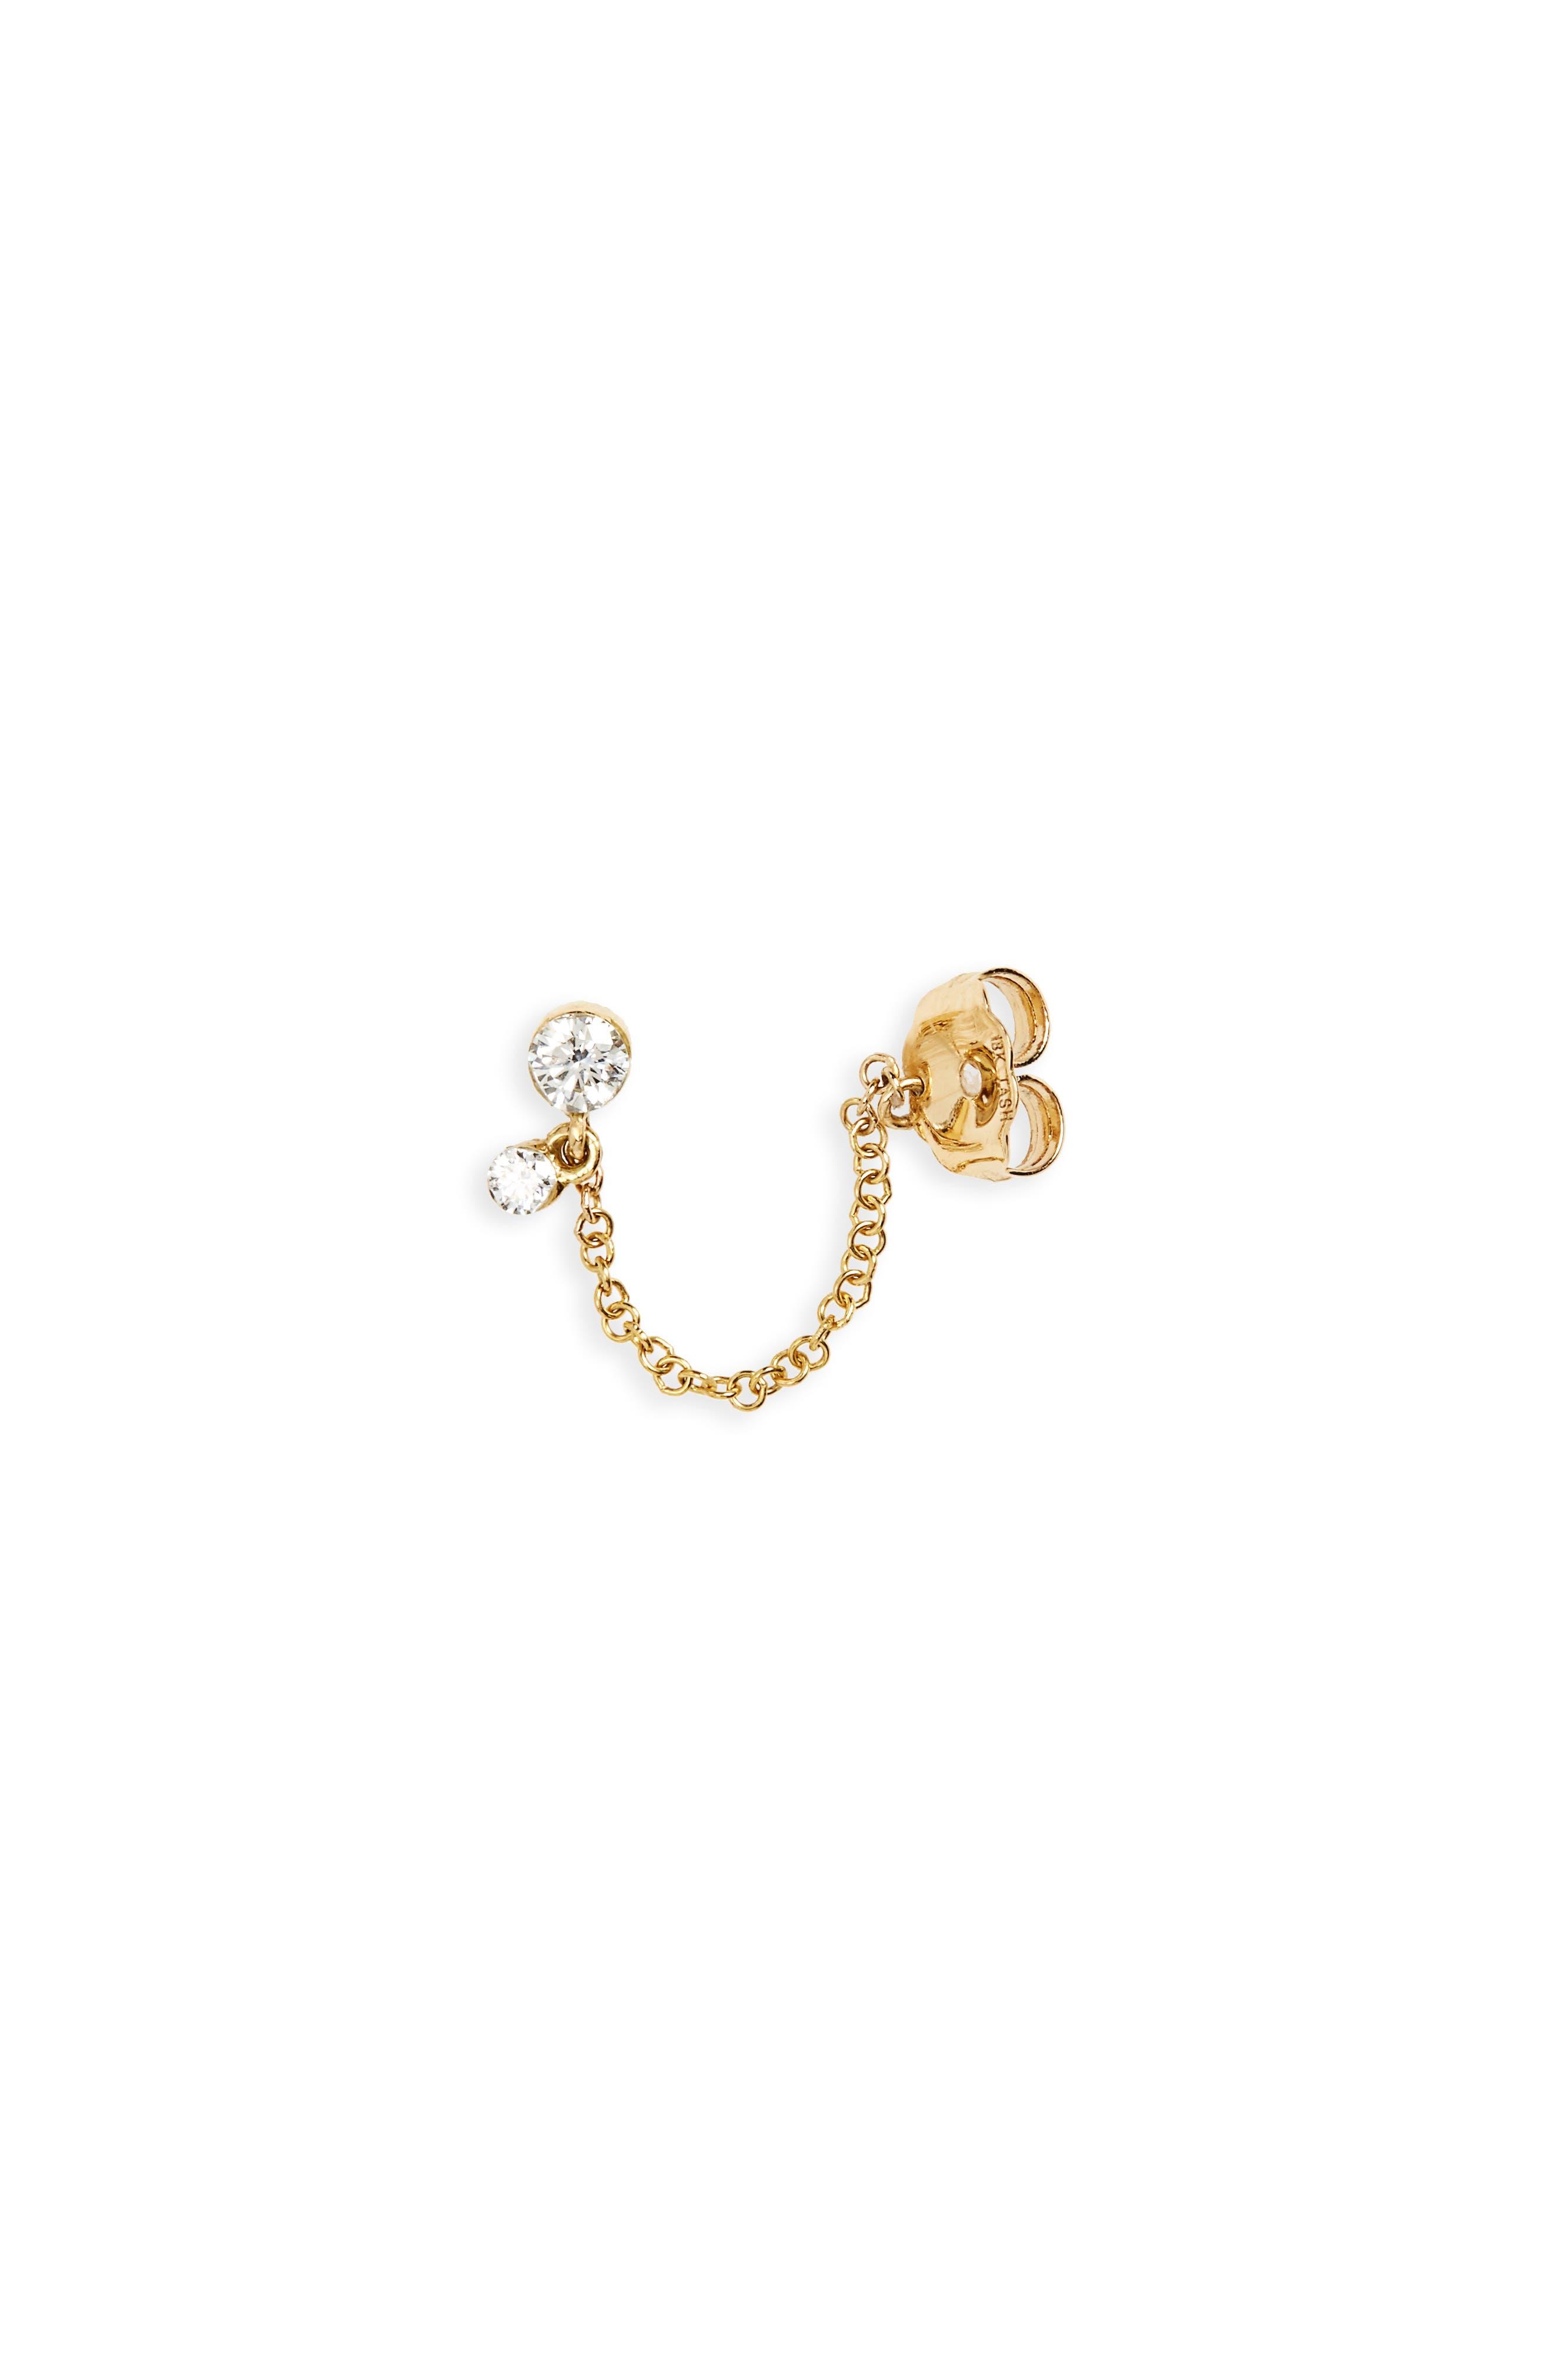 Invisibly Set Diamond Dangle & Chain Stud Earring,                             Main thumbnail 1, color,                             710